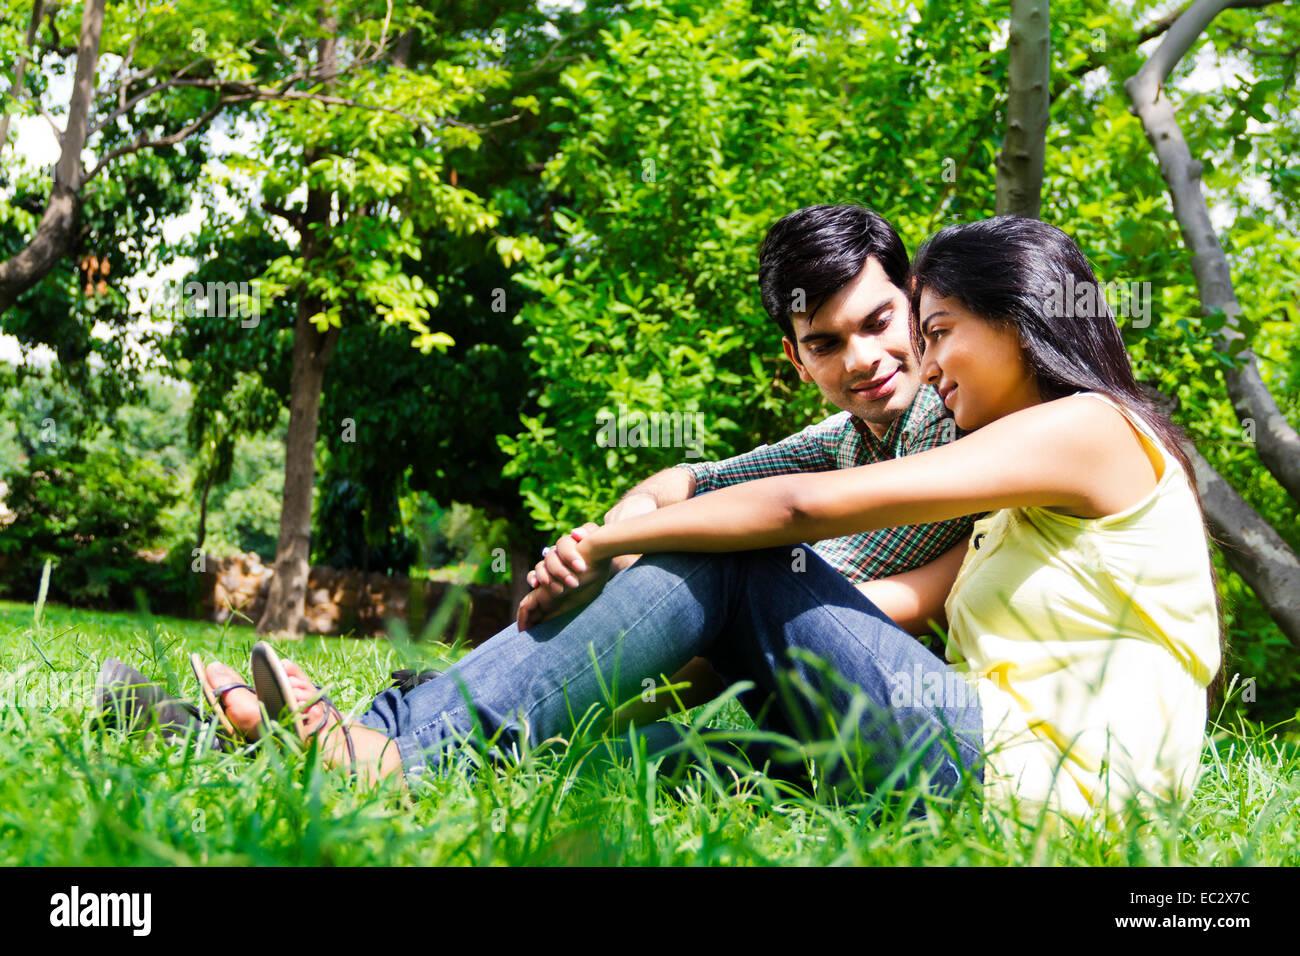 Indian dating couple somali dating site uk